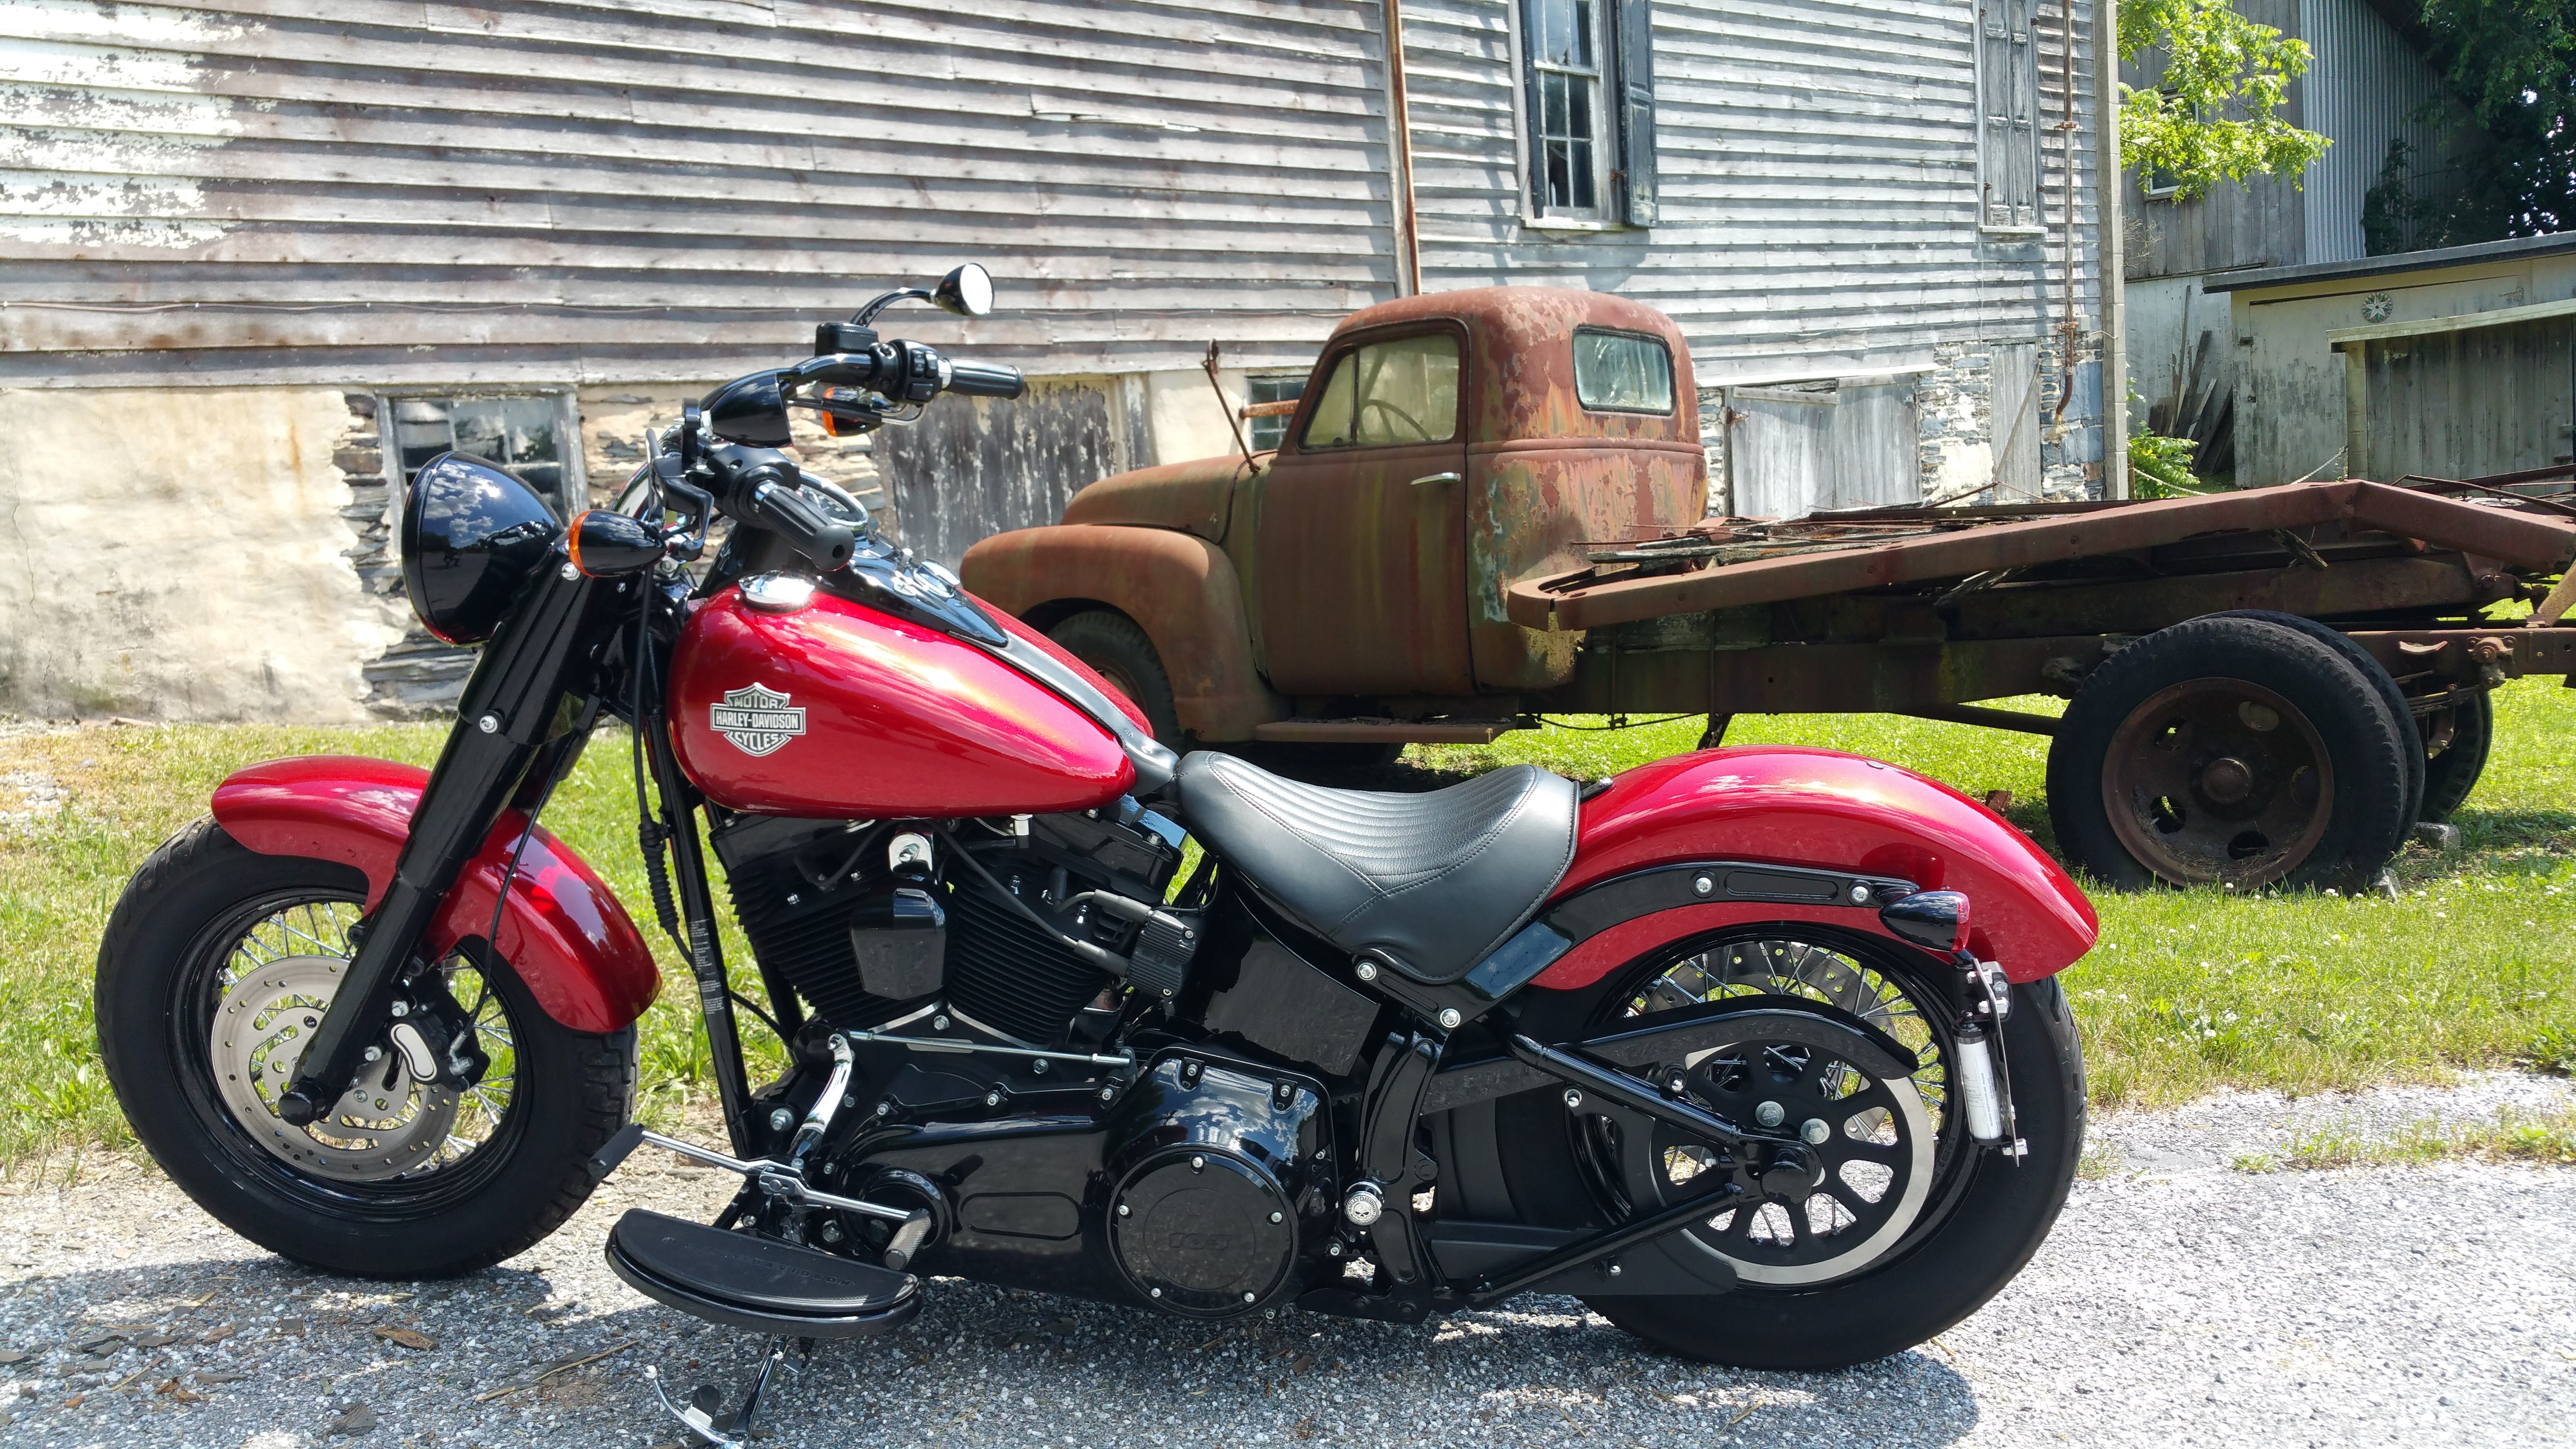 Motorcycle Dealer Near Me >> 2013 Harley-Davidson® FLS Softail® Slim (Ember Red Sunglo), Abingdon, Maryland (507681 ...